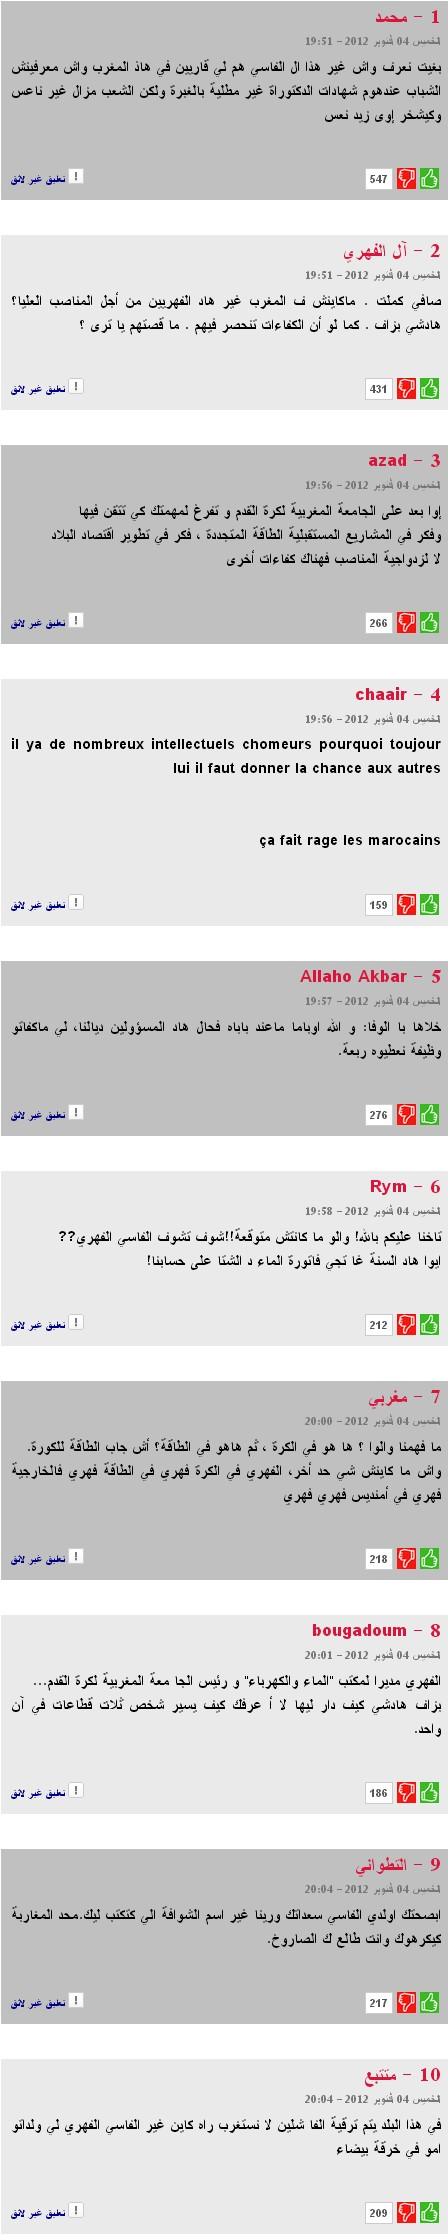 Réactions des marocains envers la nomination de ALi Fassi Ali110